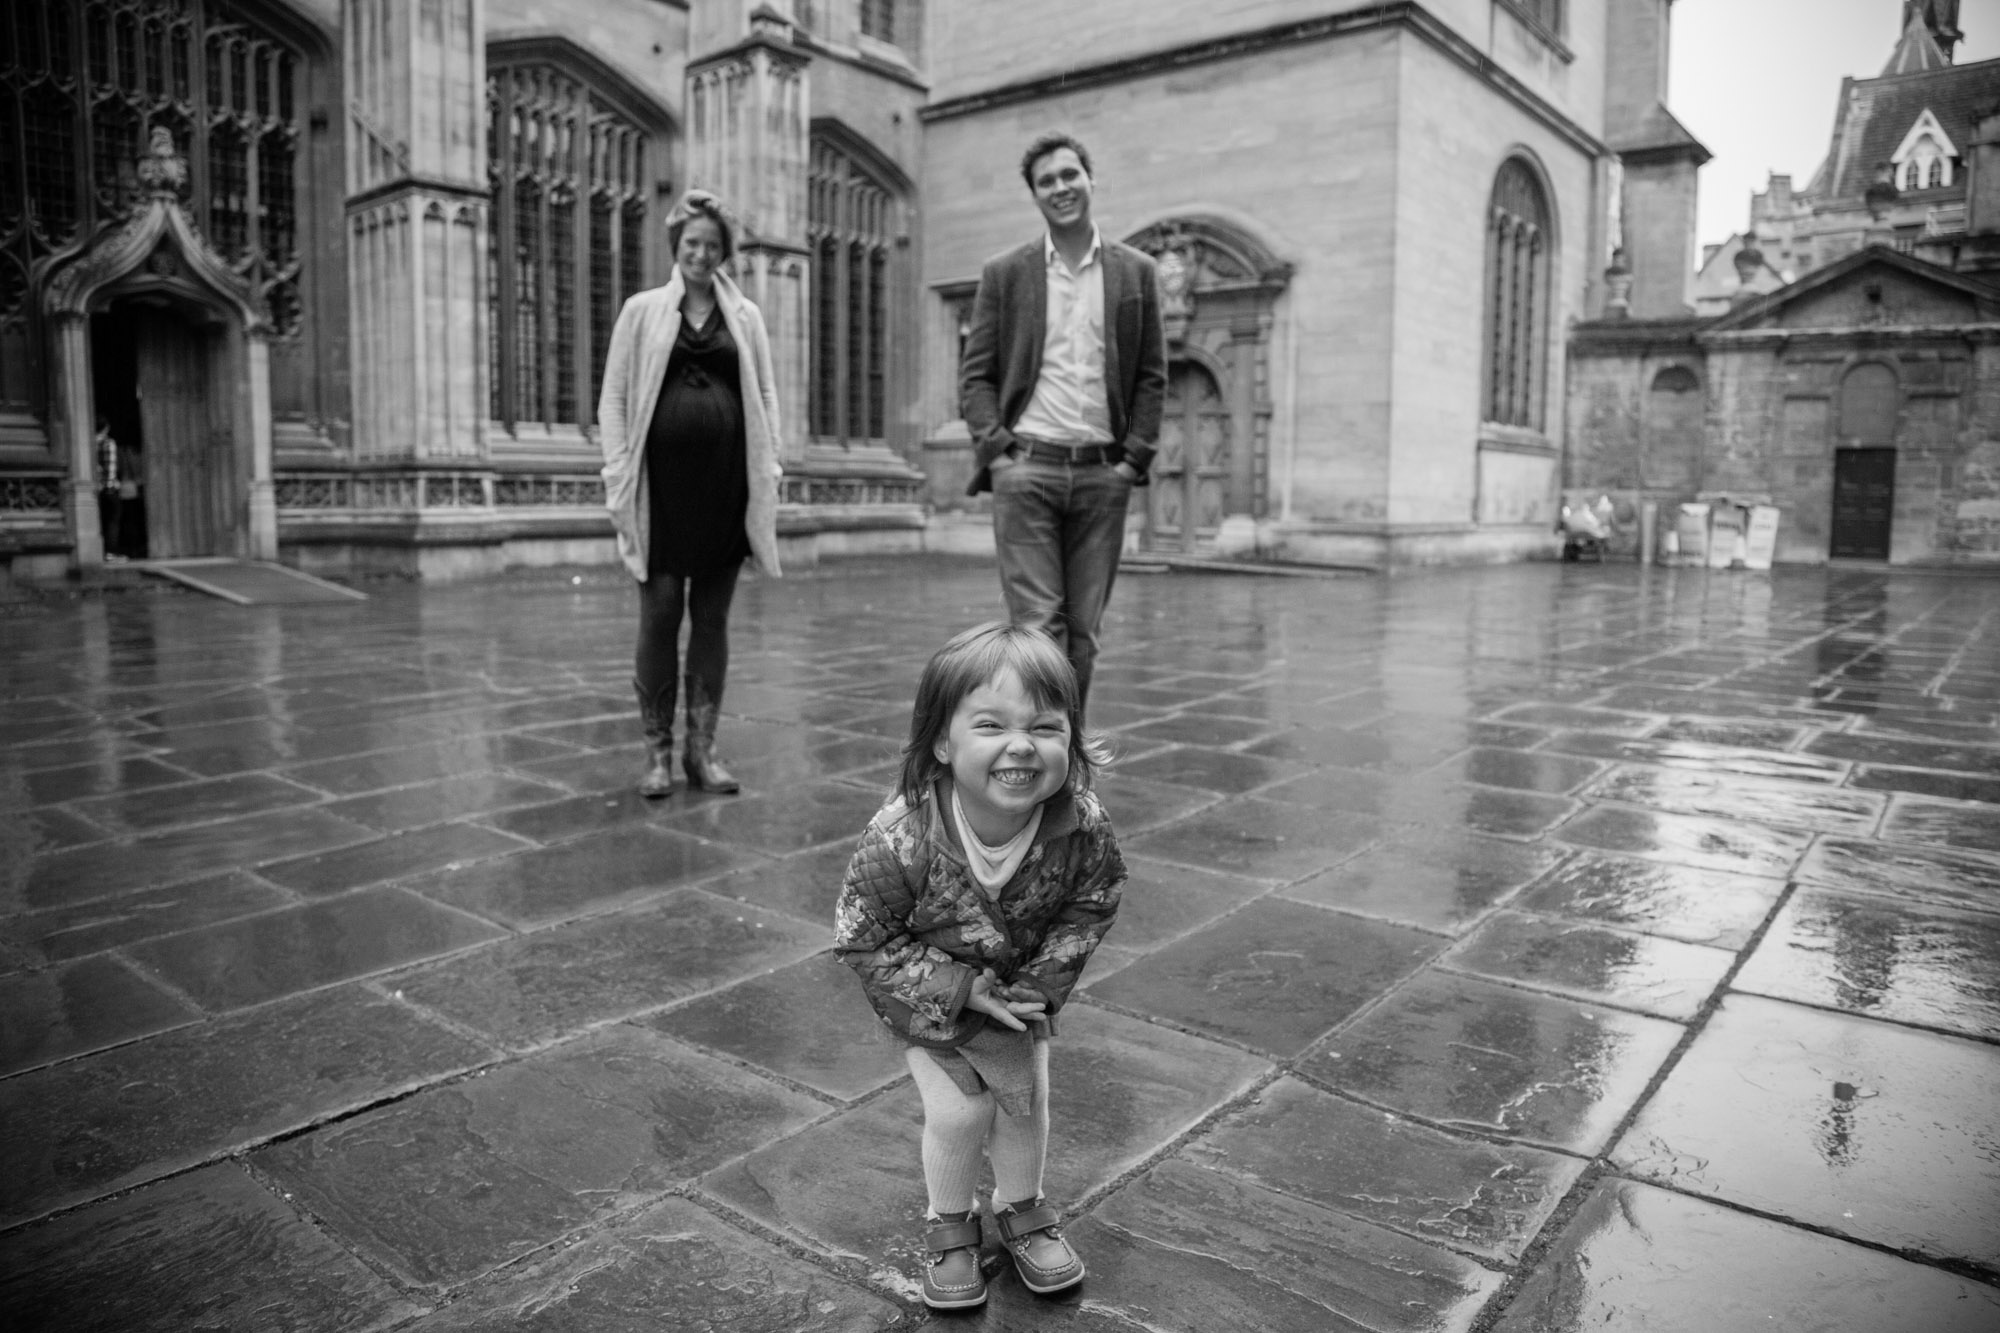 family-life-family-photographer-oxford-london-jonathan-self-photography-17.jpg